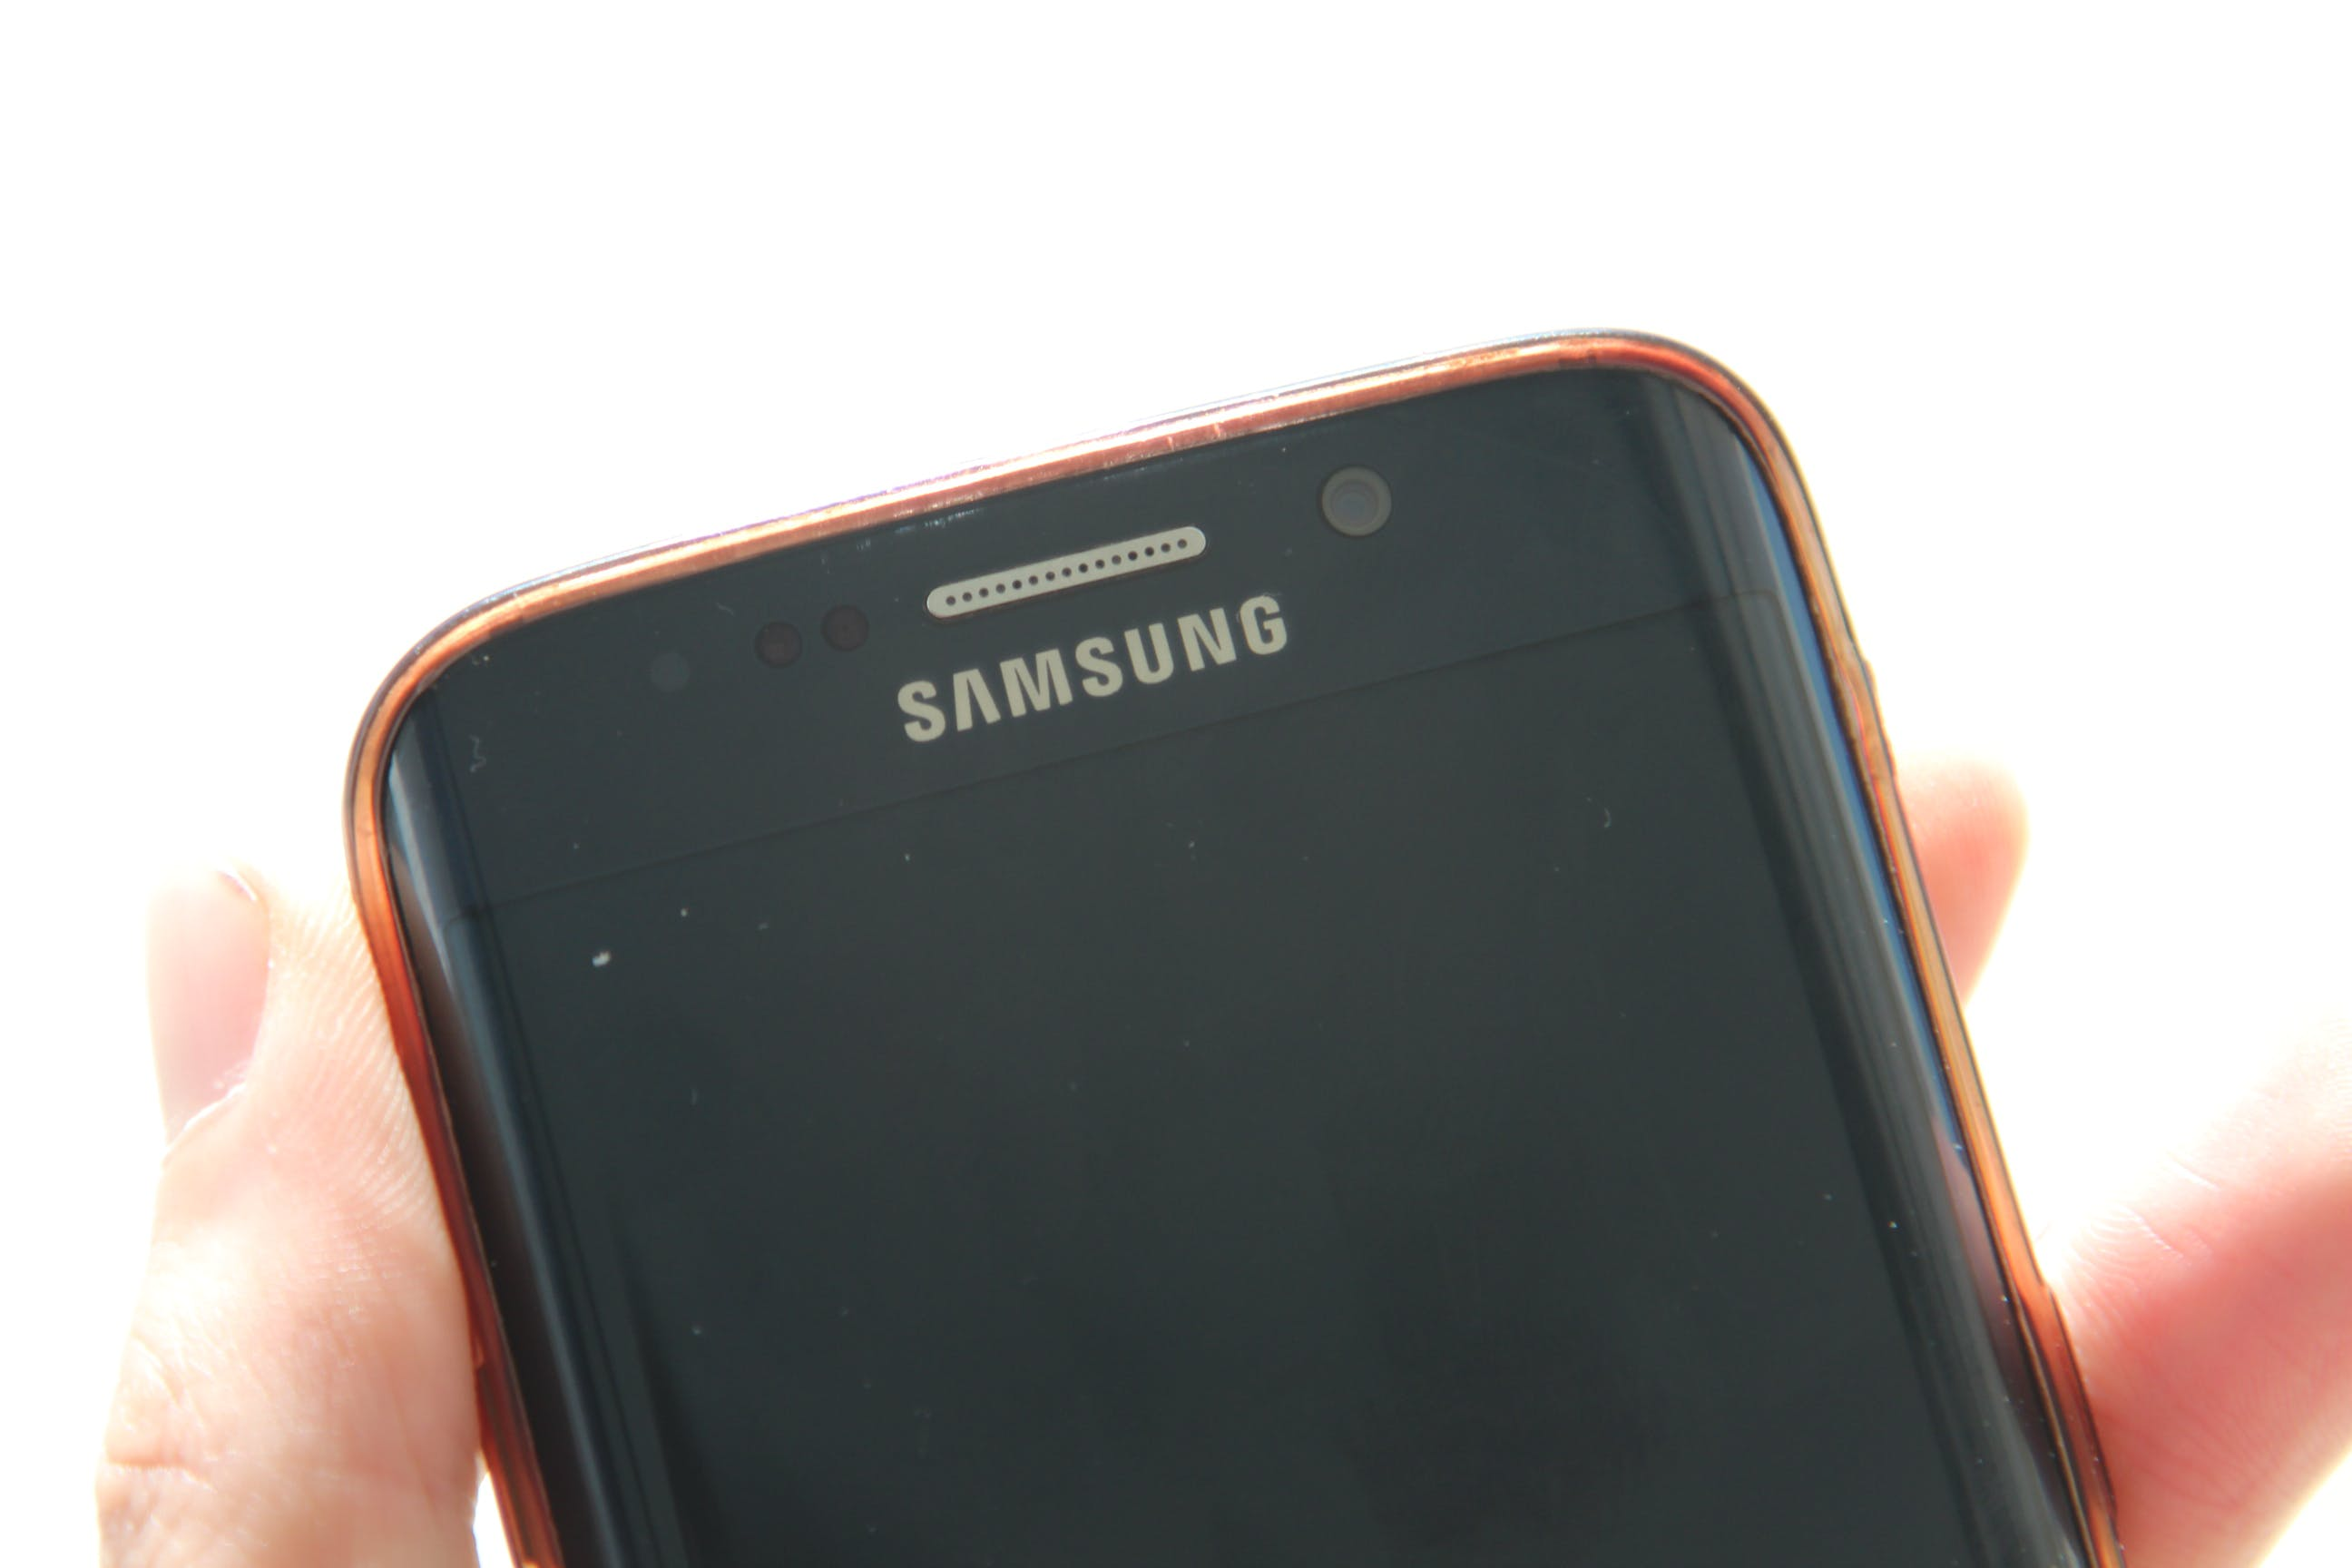 Free stock photo of phone, Samsung Galaxy S6 Edge Plus